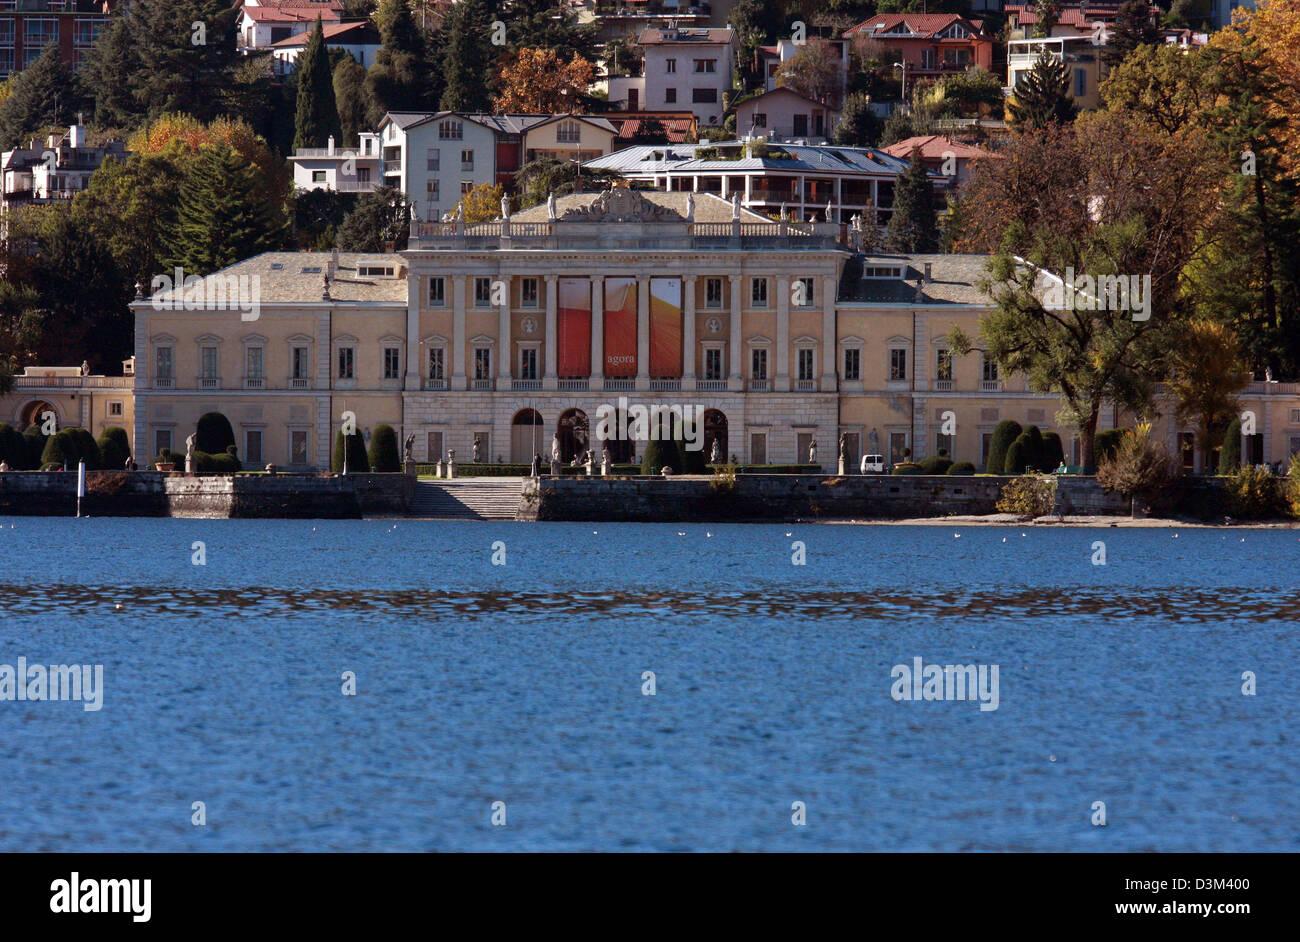 Italy, Lombardy, Lake Como. Villa Aurora Hotel - Stock Image